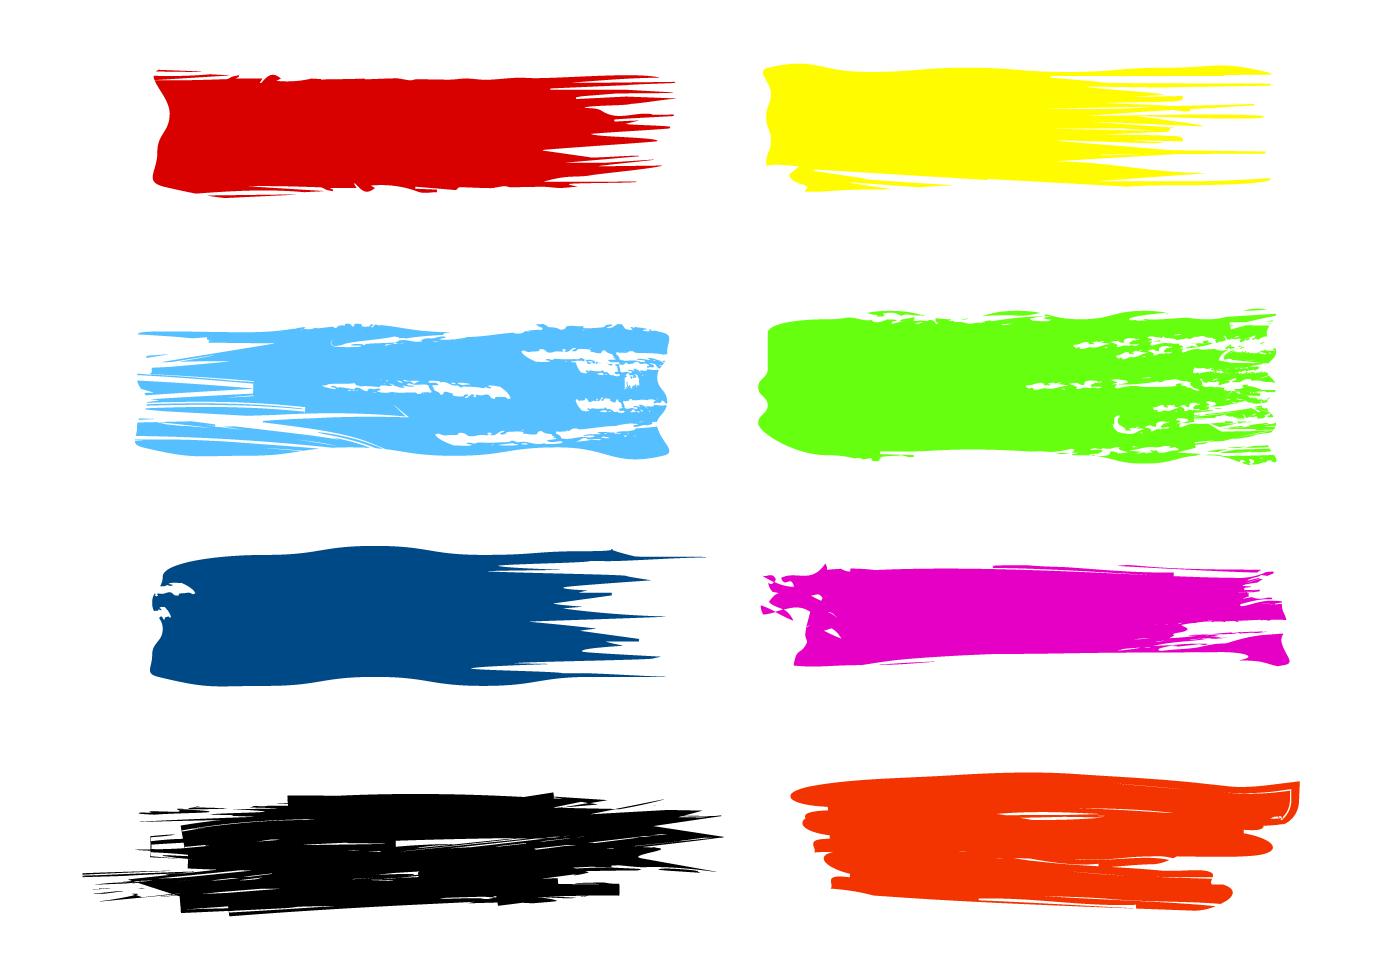 Paint brush stroke clipart download Paint Brush Stroke Clipart | Free download best Paint Brush Stroke ... download